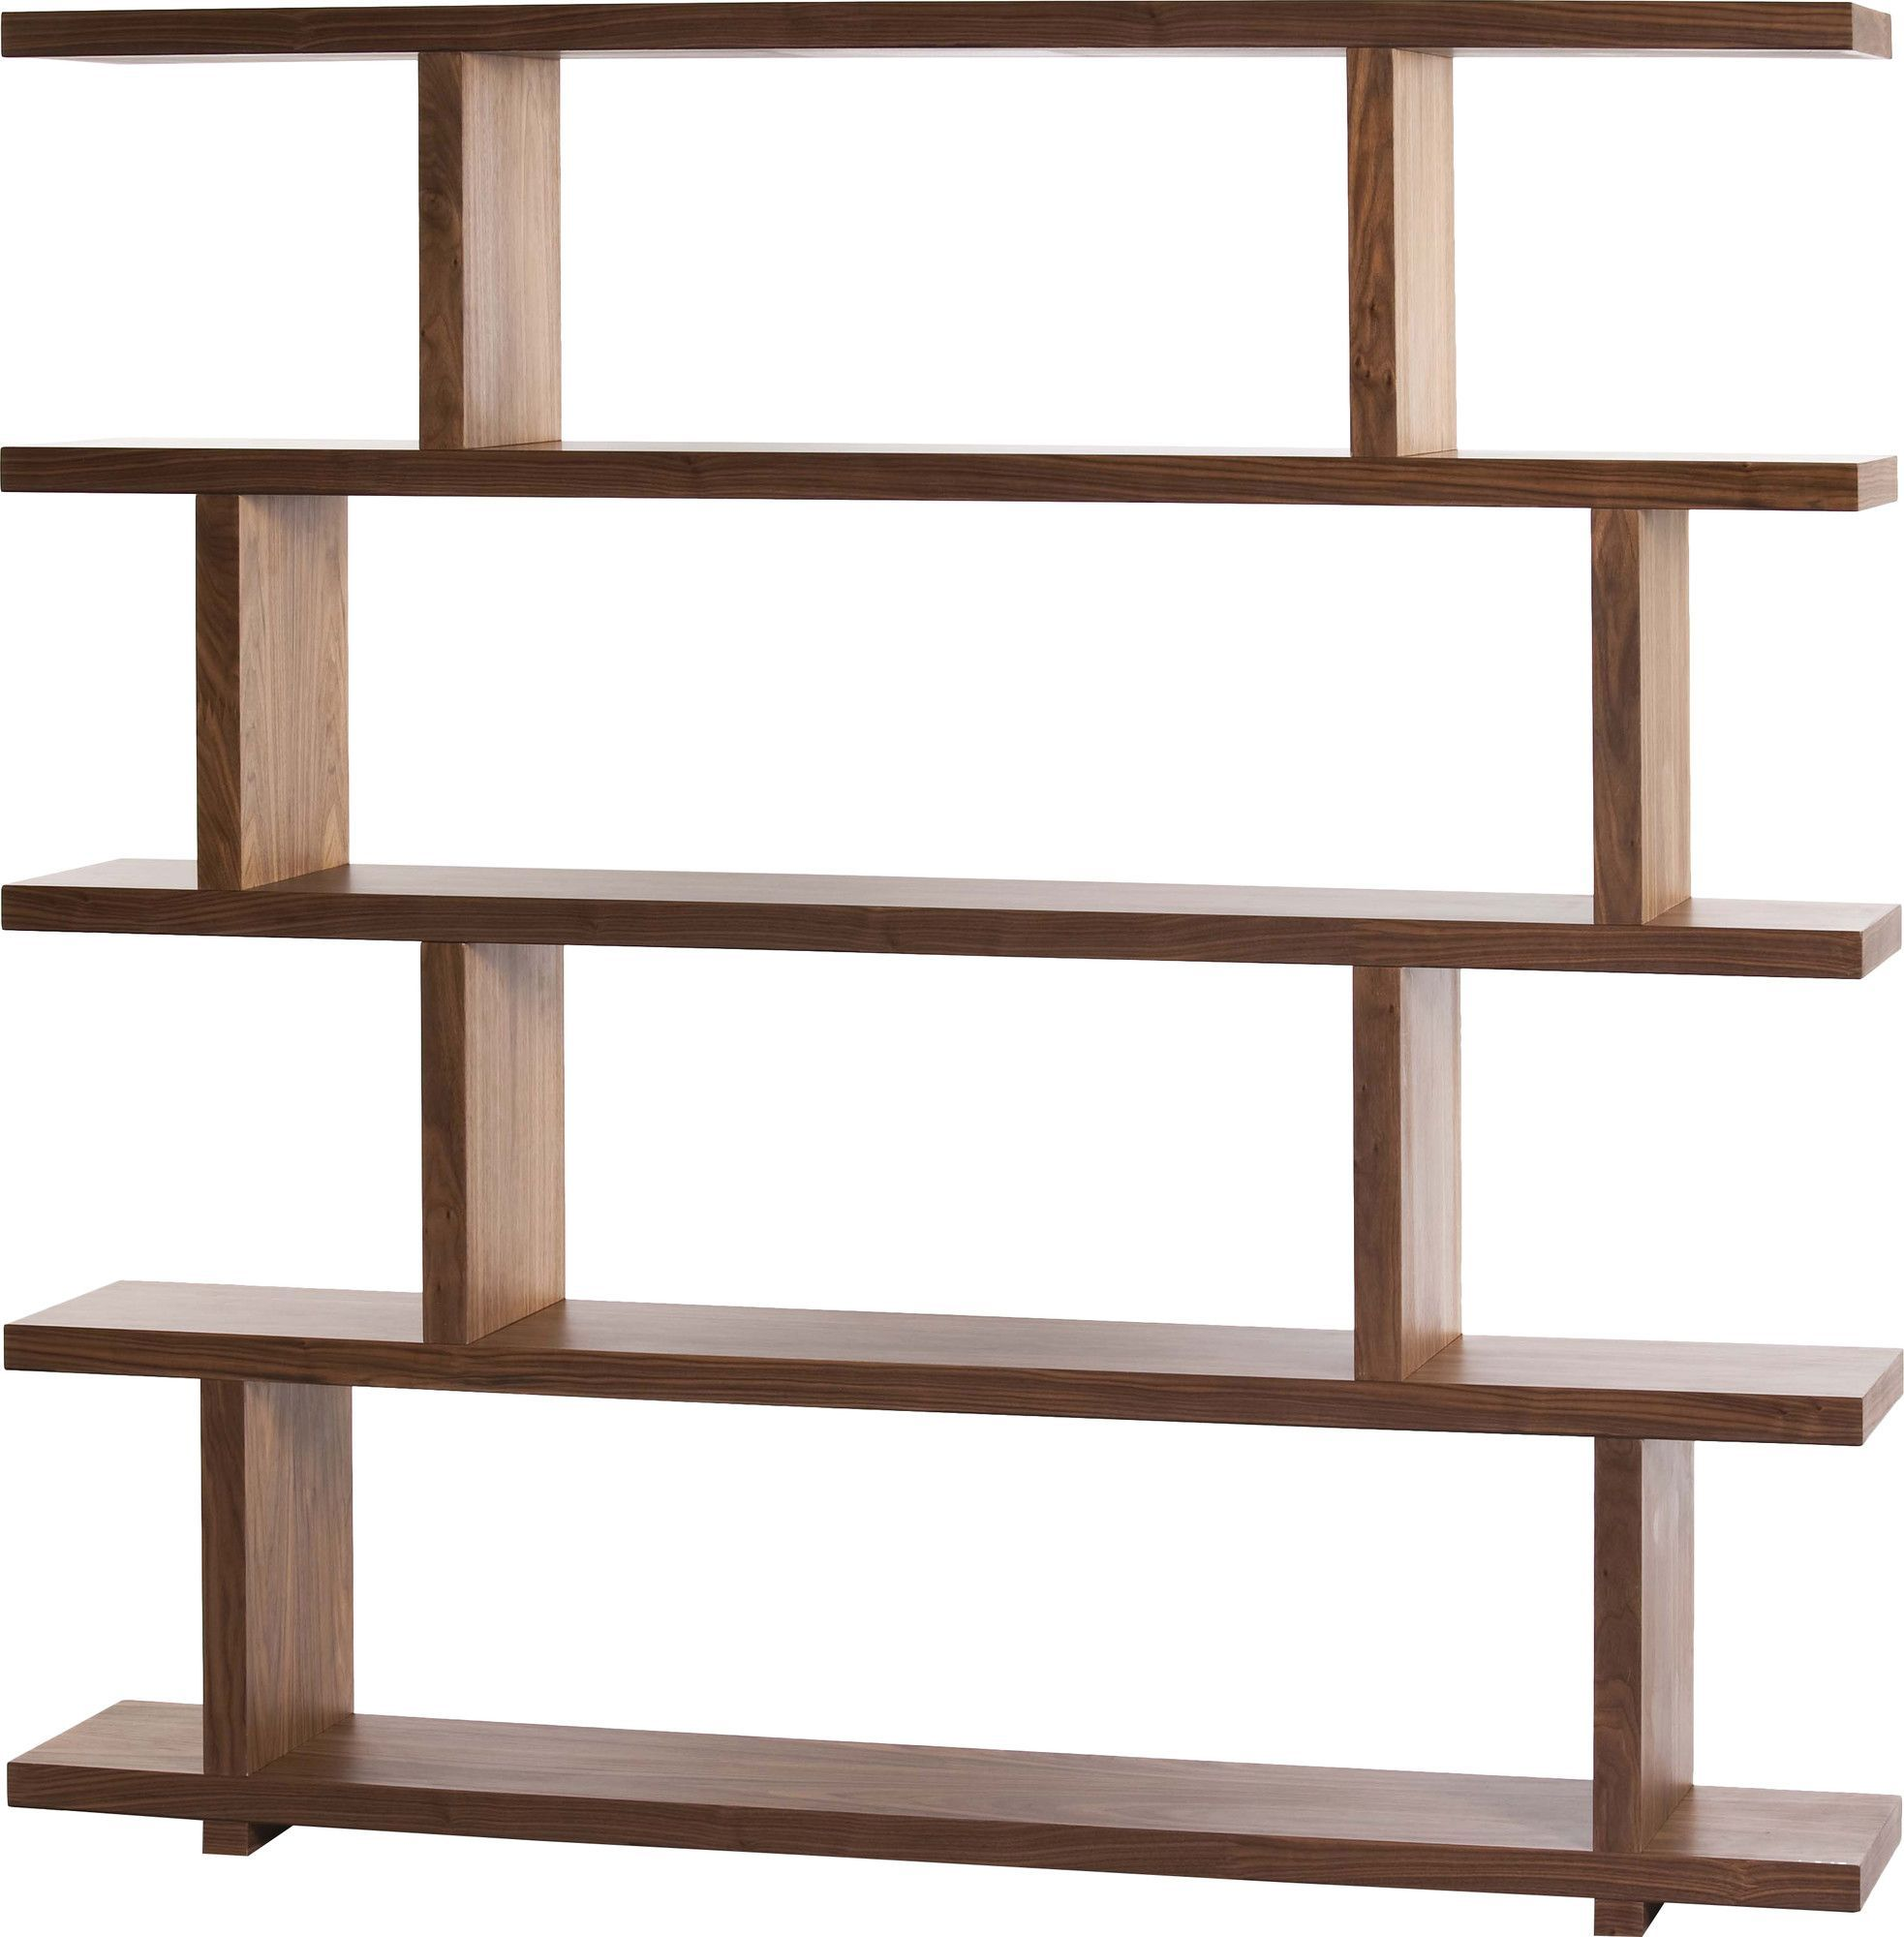 "Raney 62.6"" Accent Shelves Bookcase"